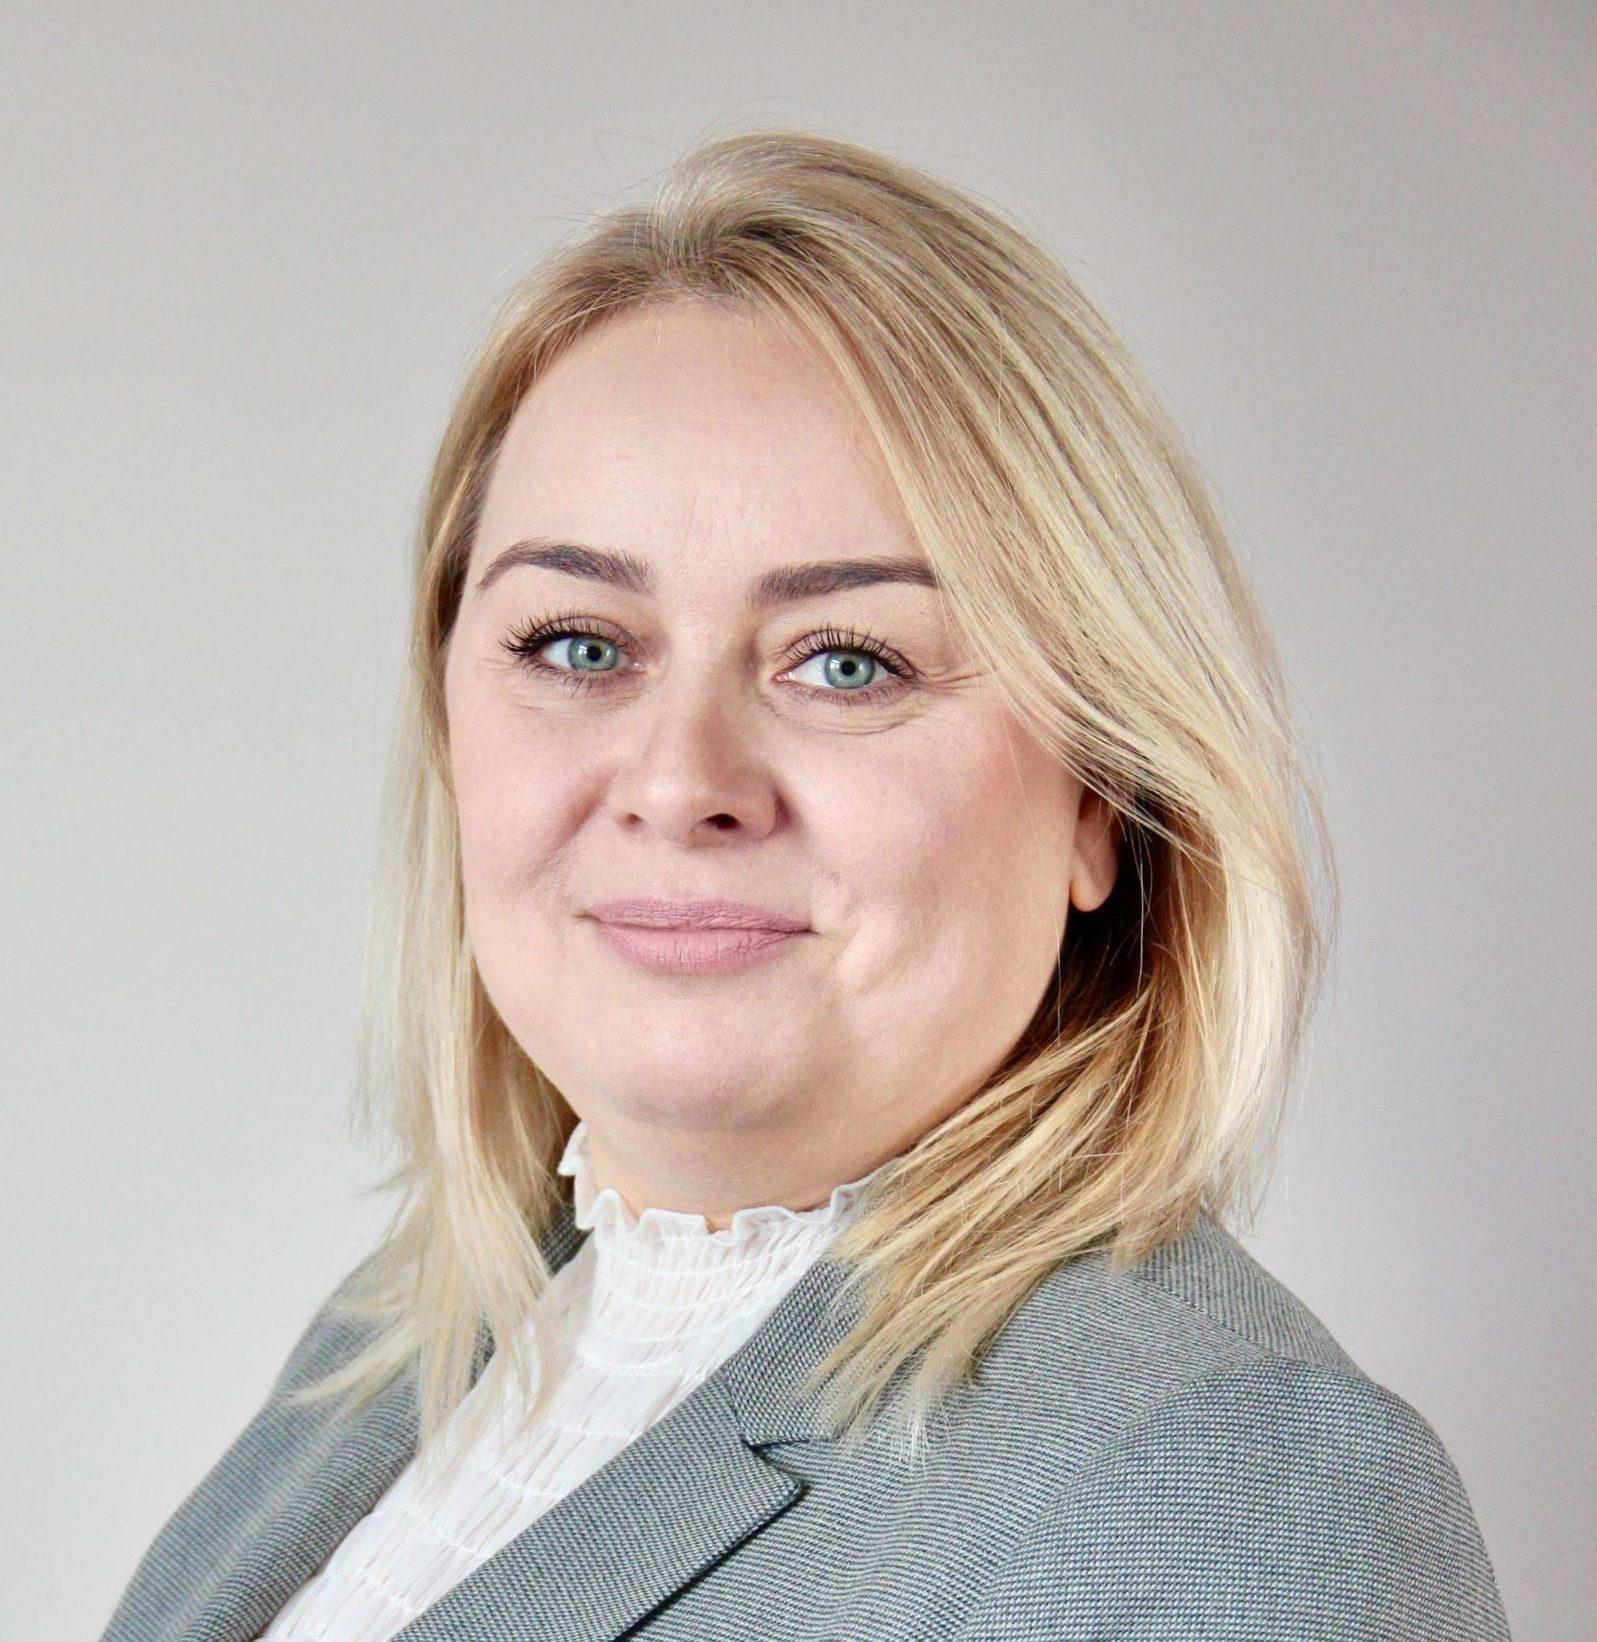 Izabella Domżalska